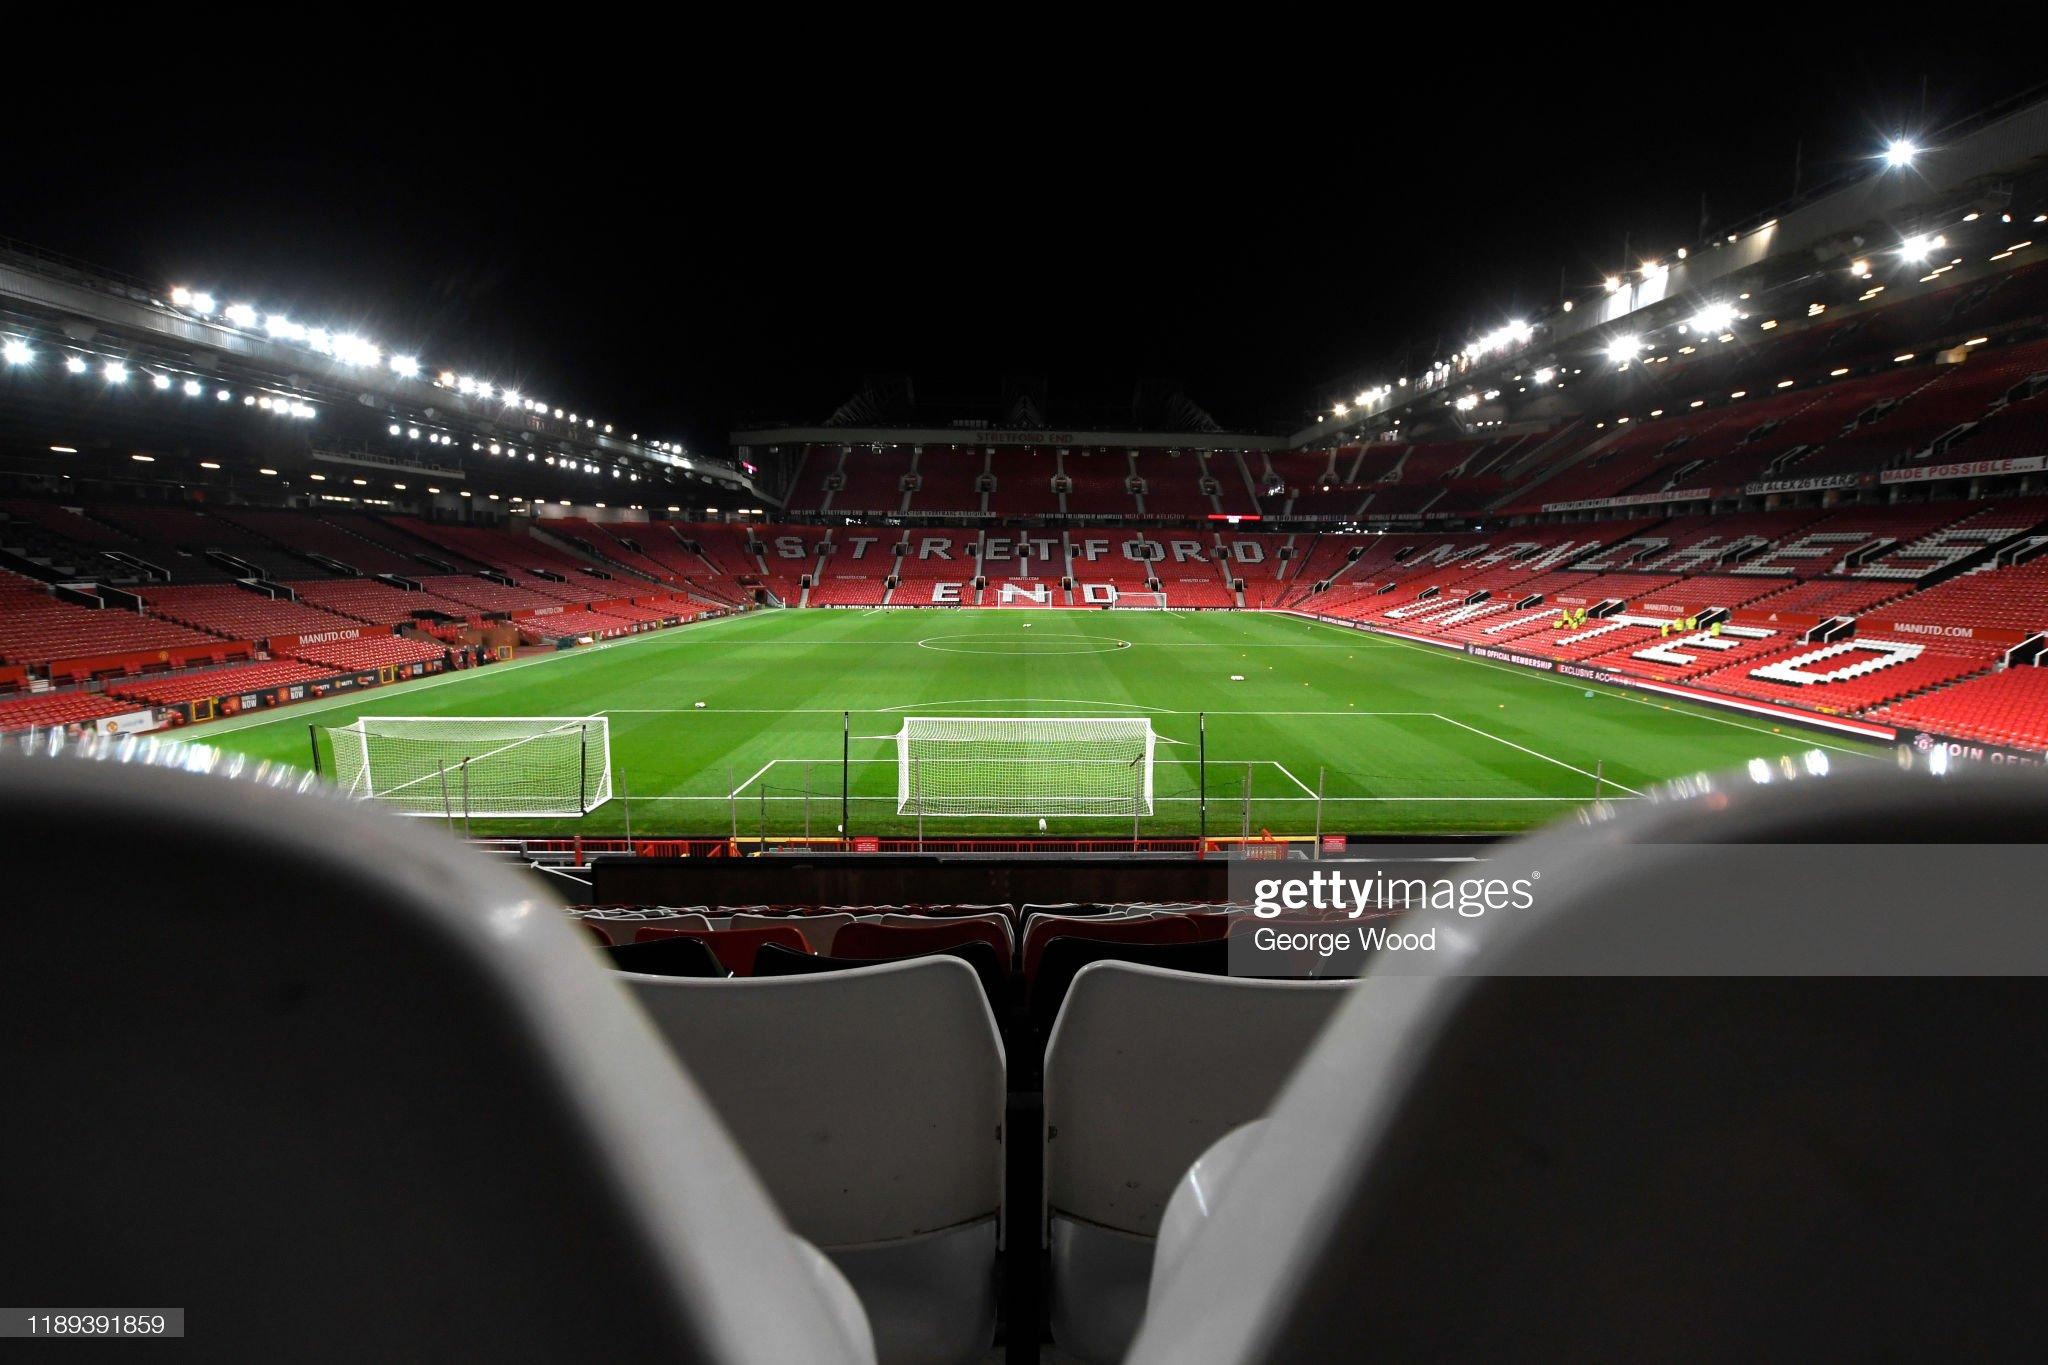 Manchester United v Aston Villa preview, prediction and odds